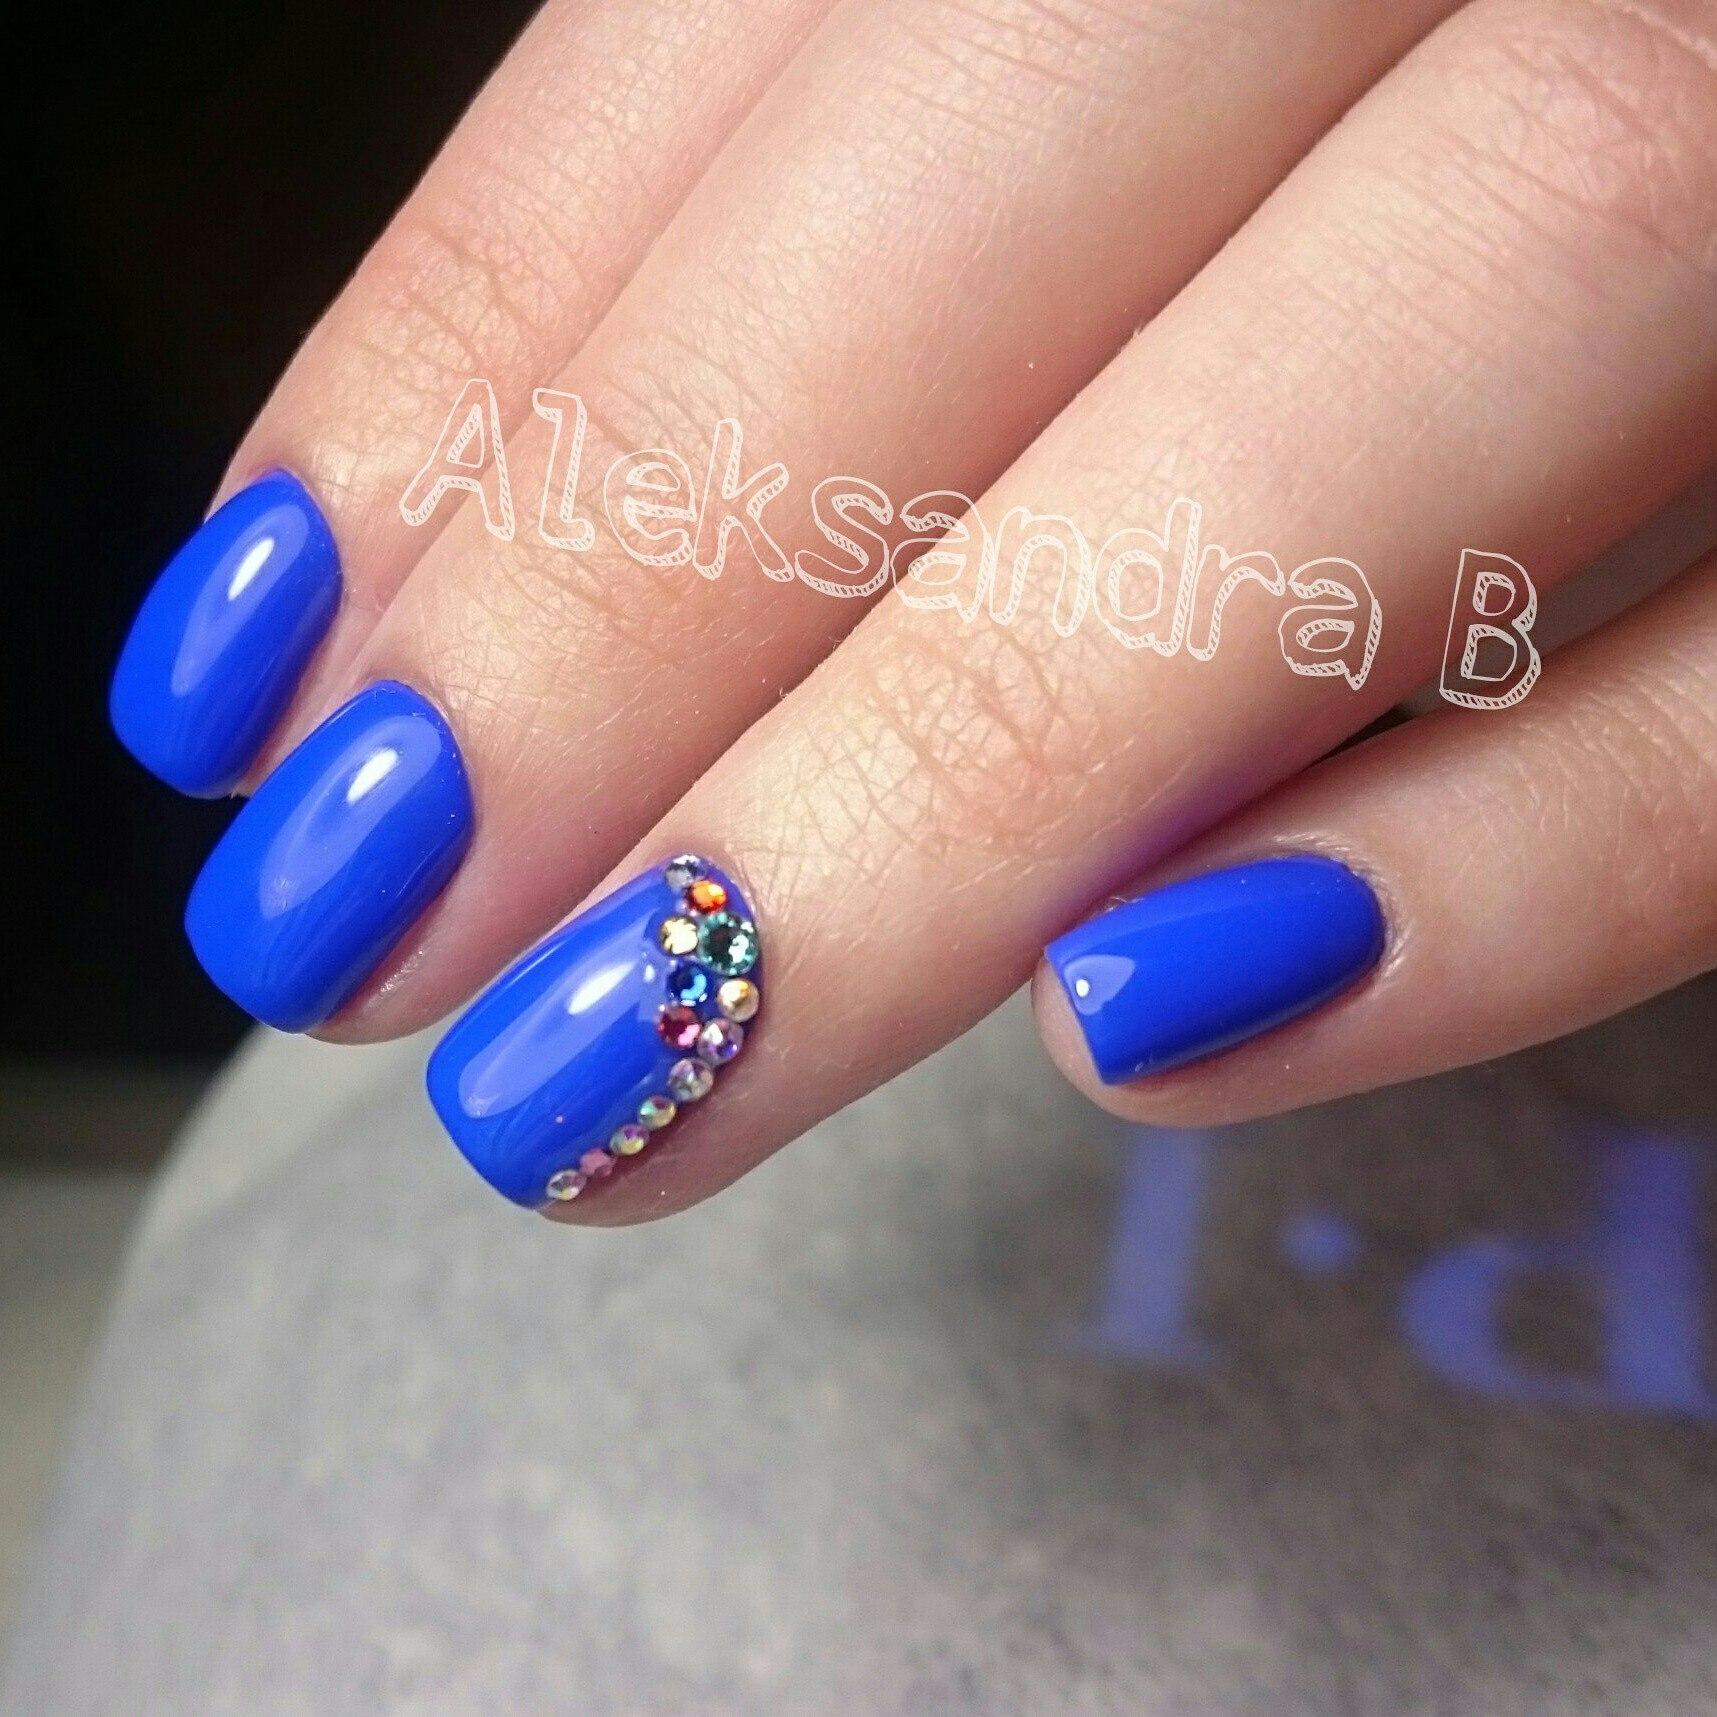 Маникюр на короткие ногти фото в синем цвете